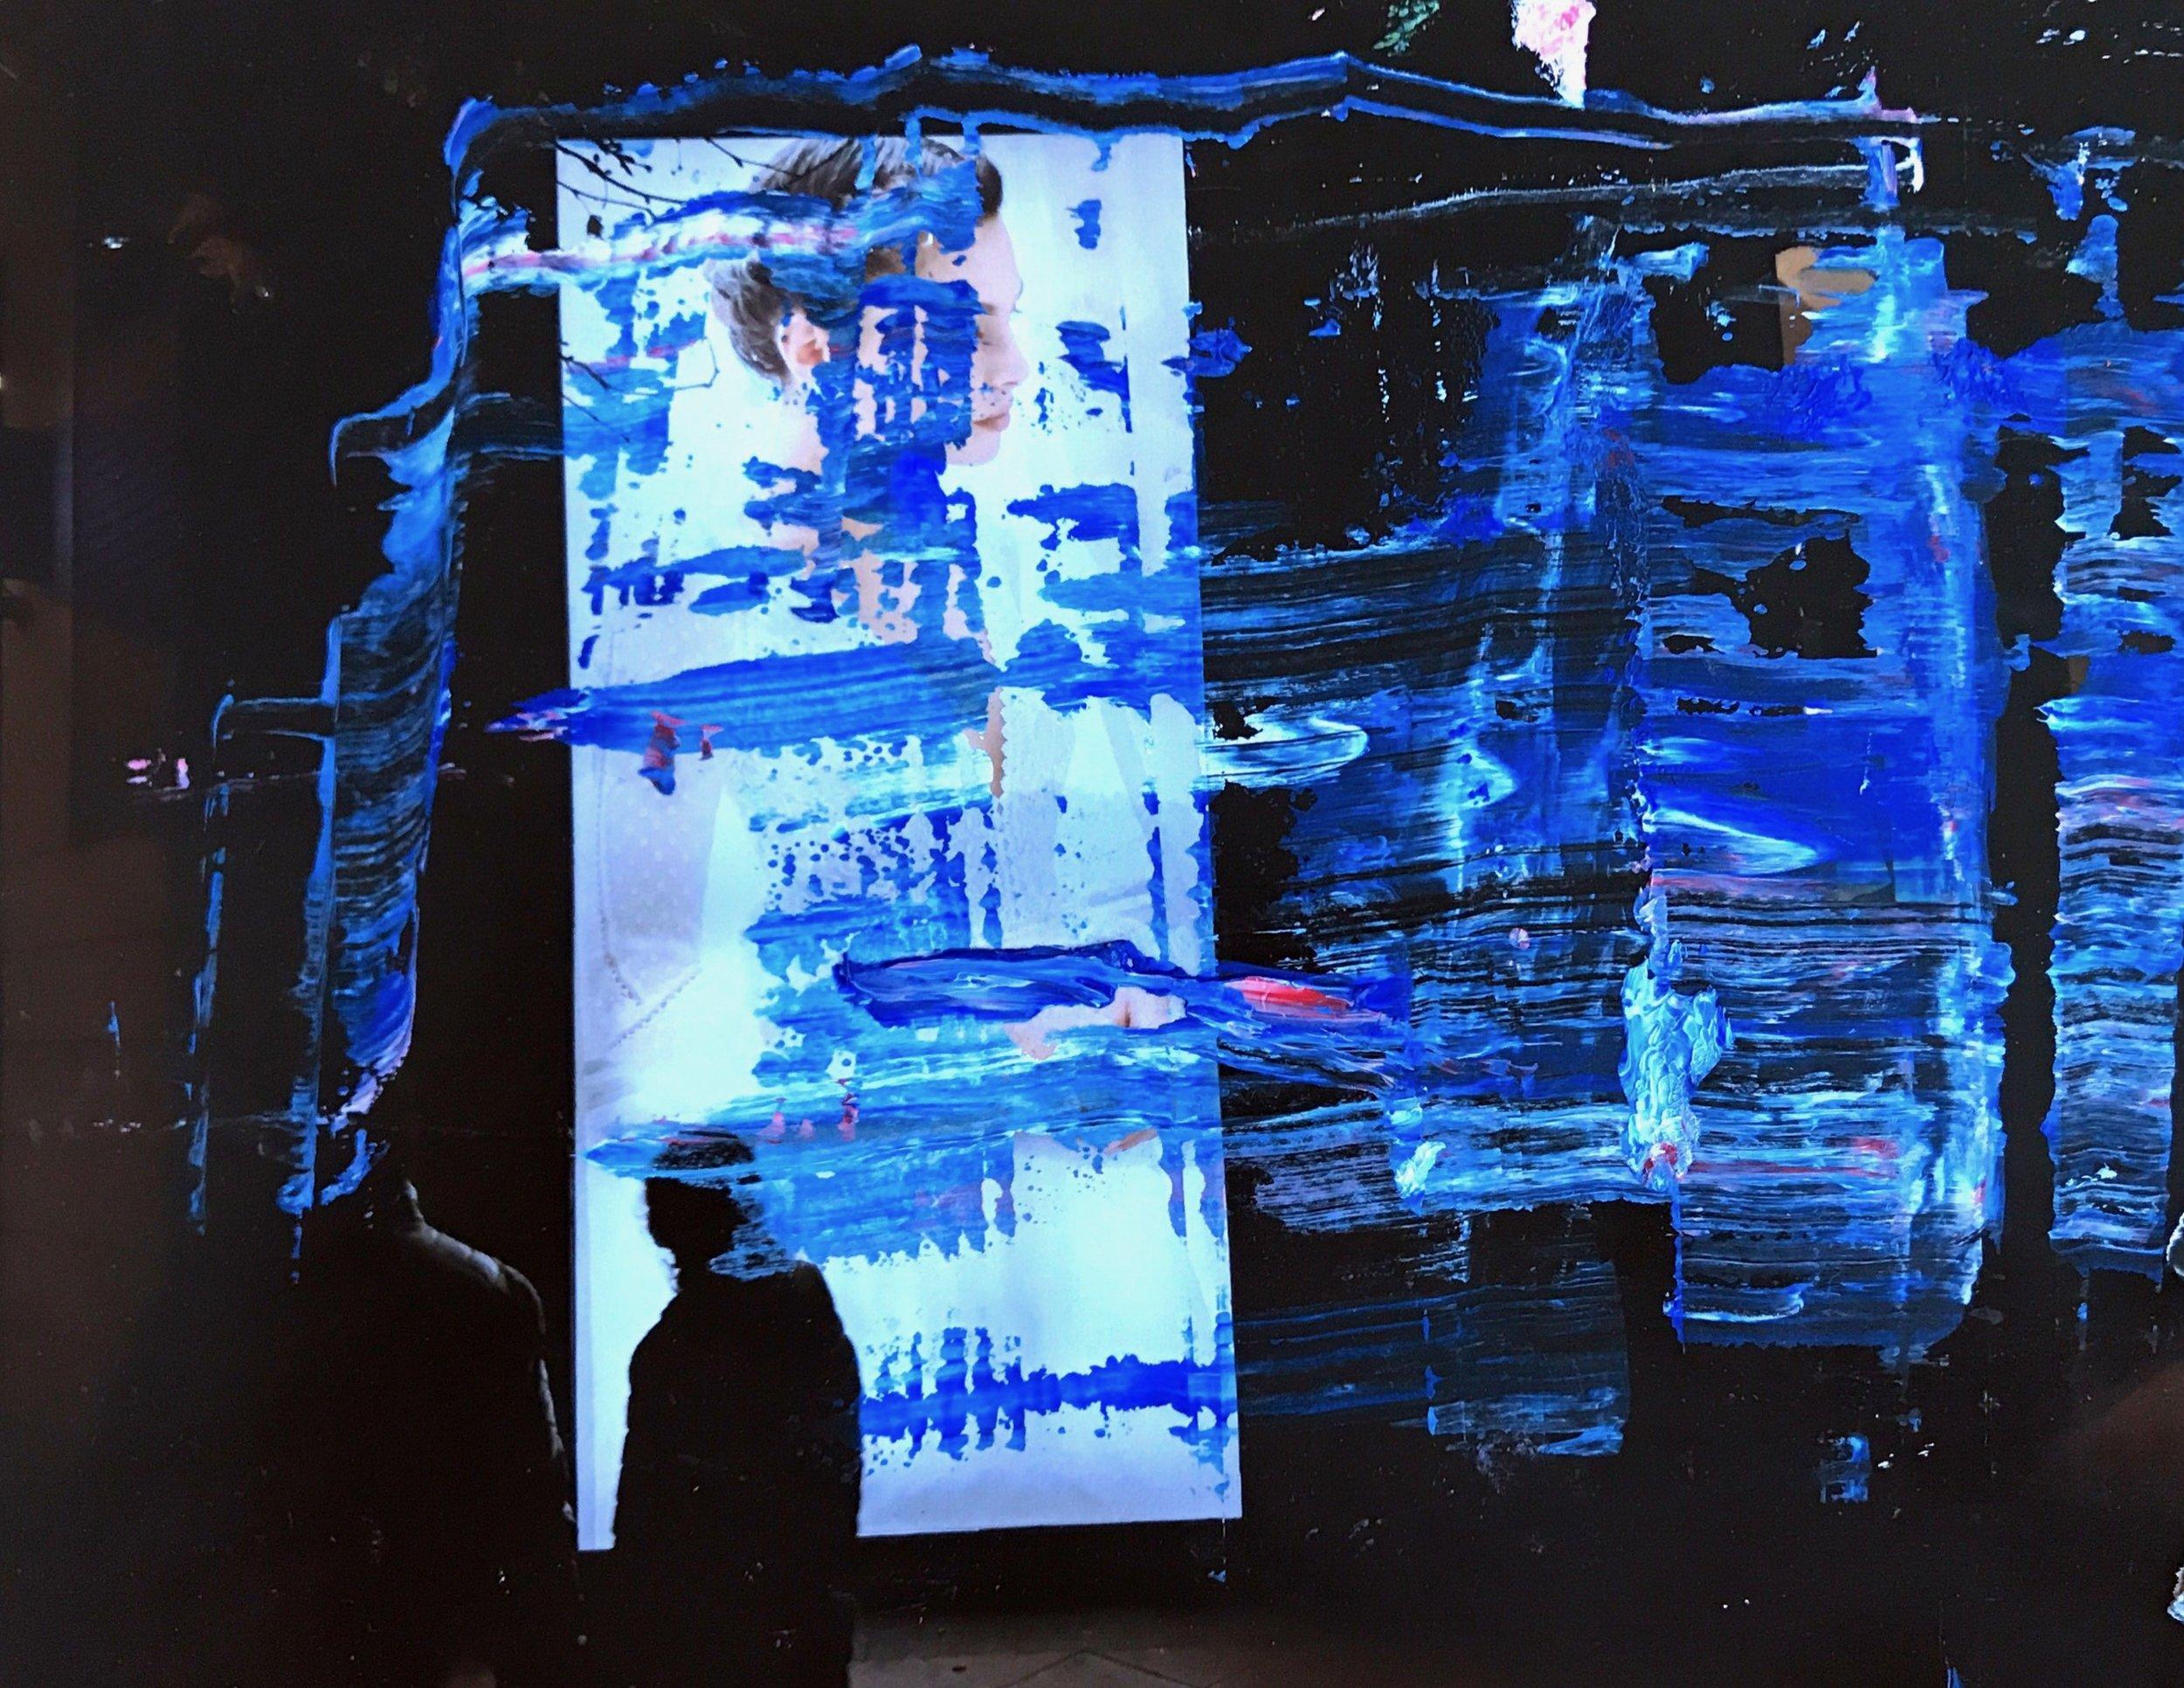 """Pronovias"" Oil paint over printed photograph. Boston, 2018."